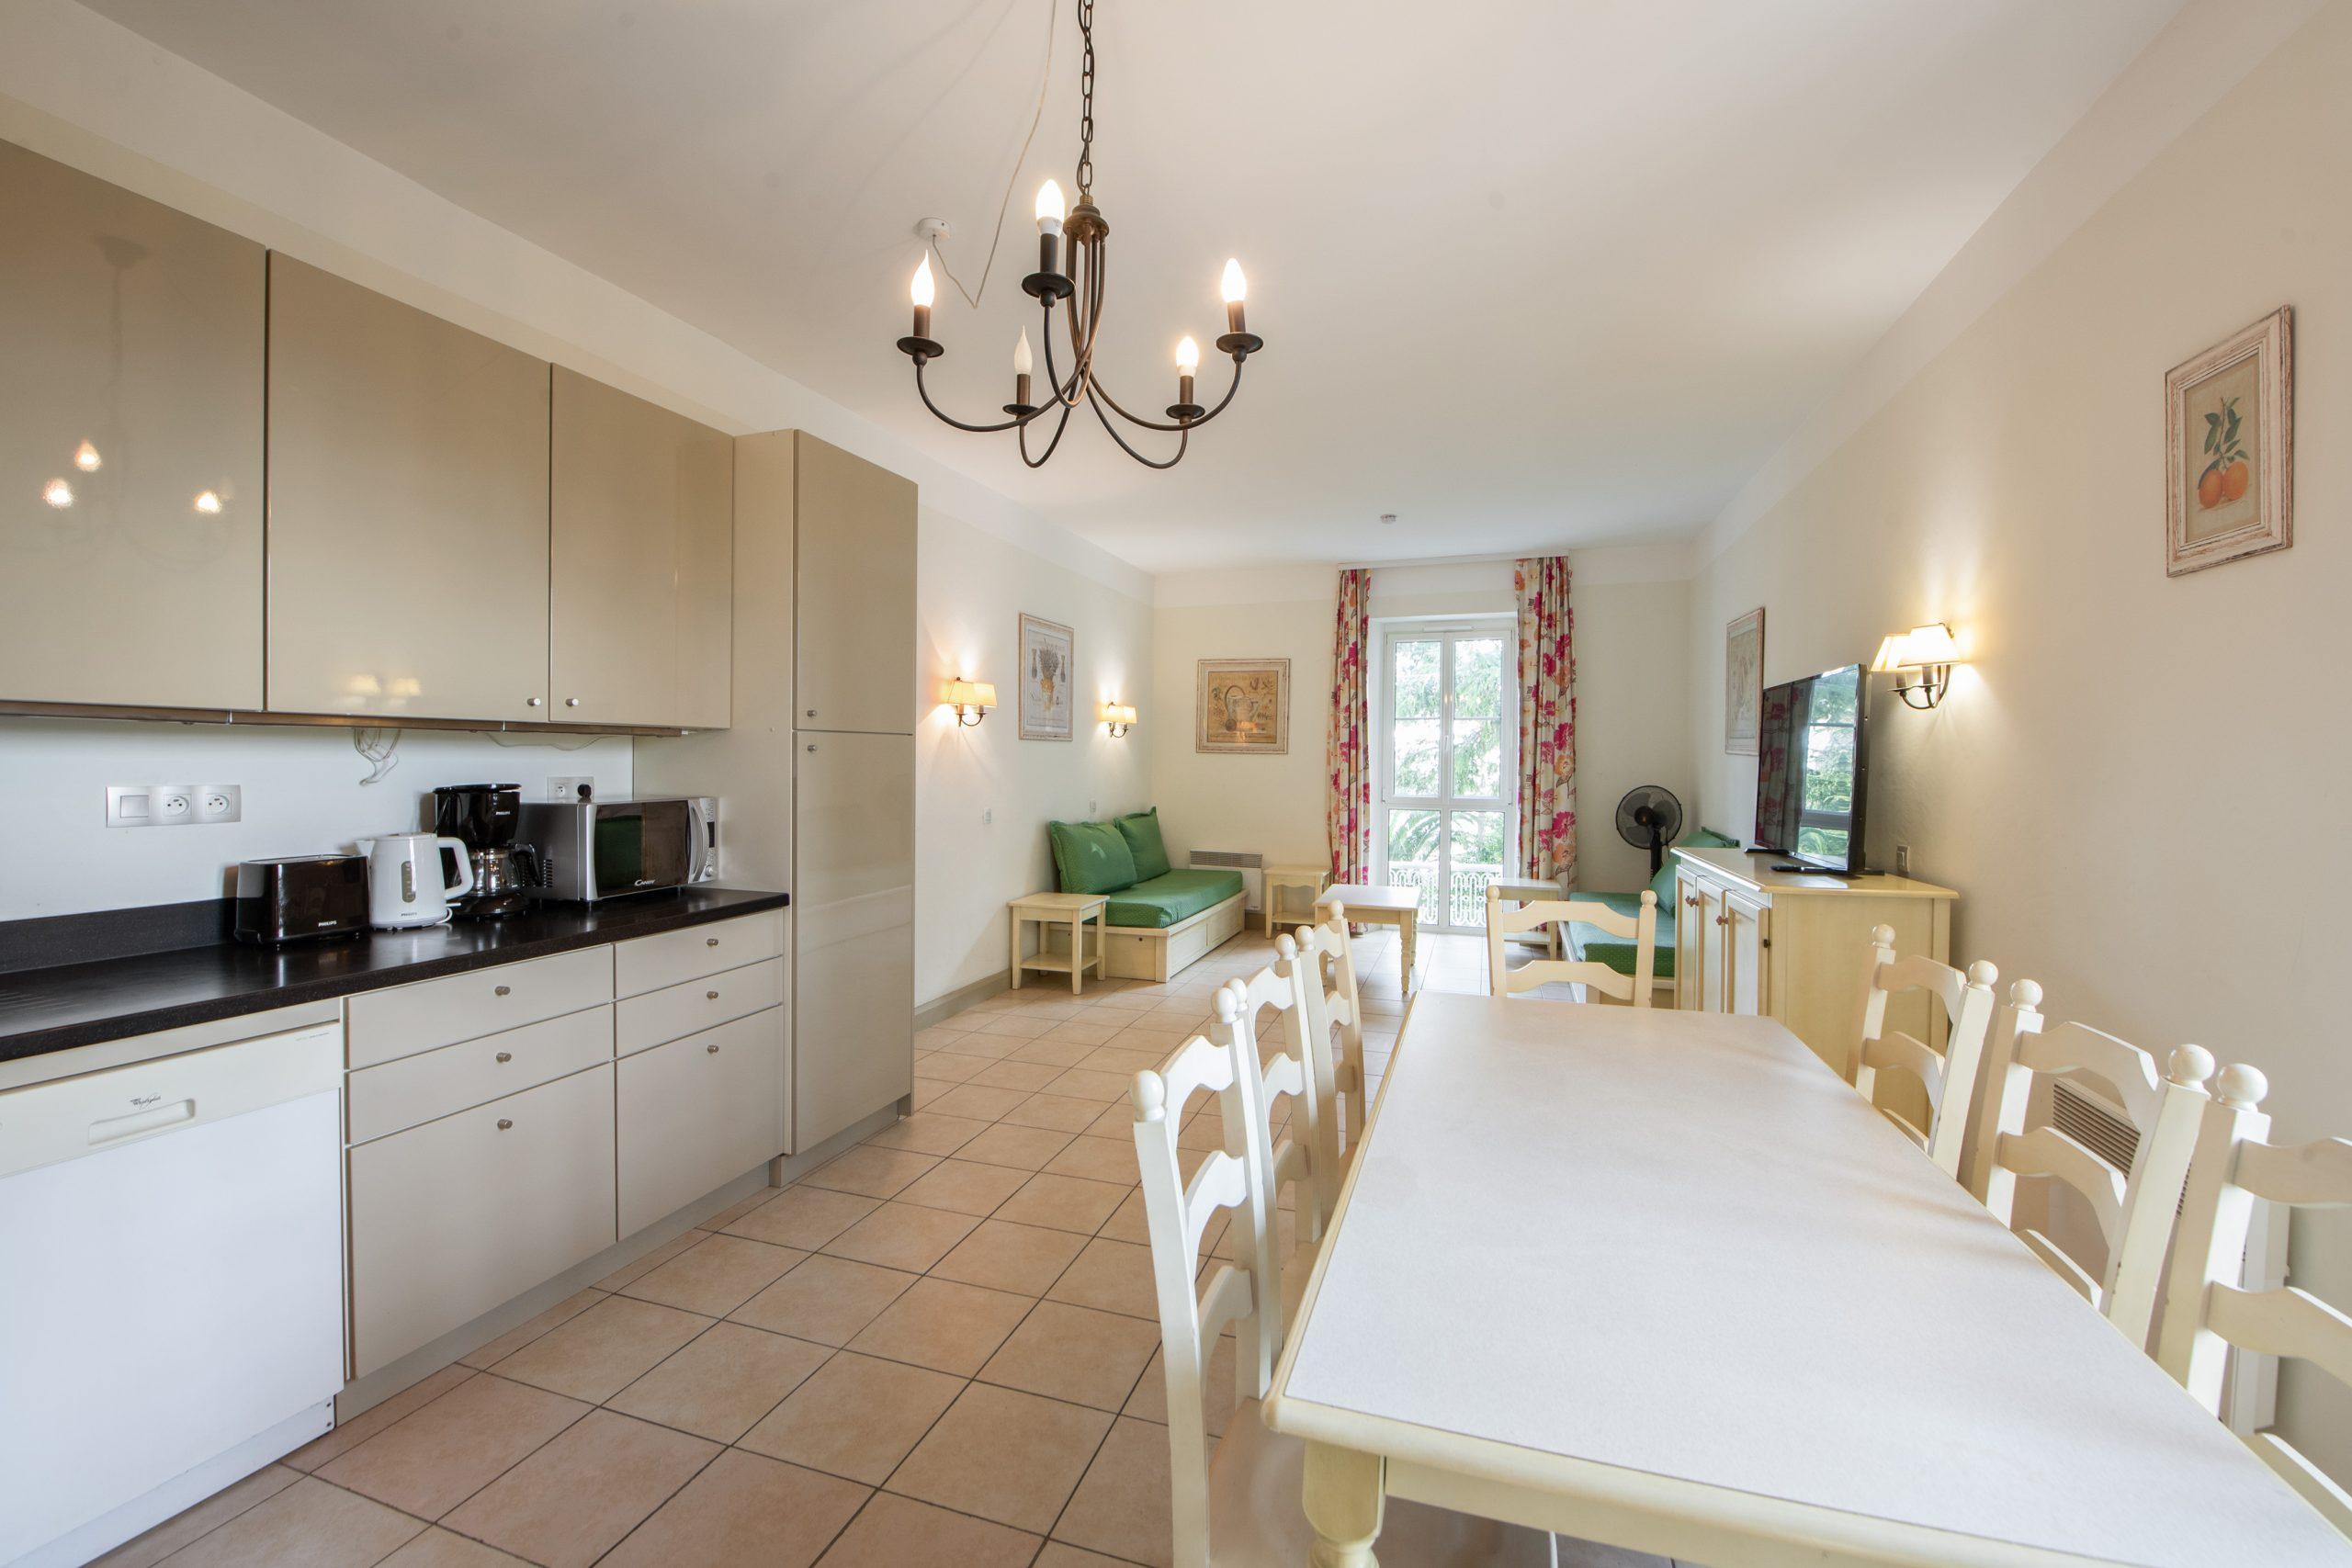 Cannes Croix des Gardes – 3 Bedrooms Apartment 84 sqm in Property with Park